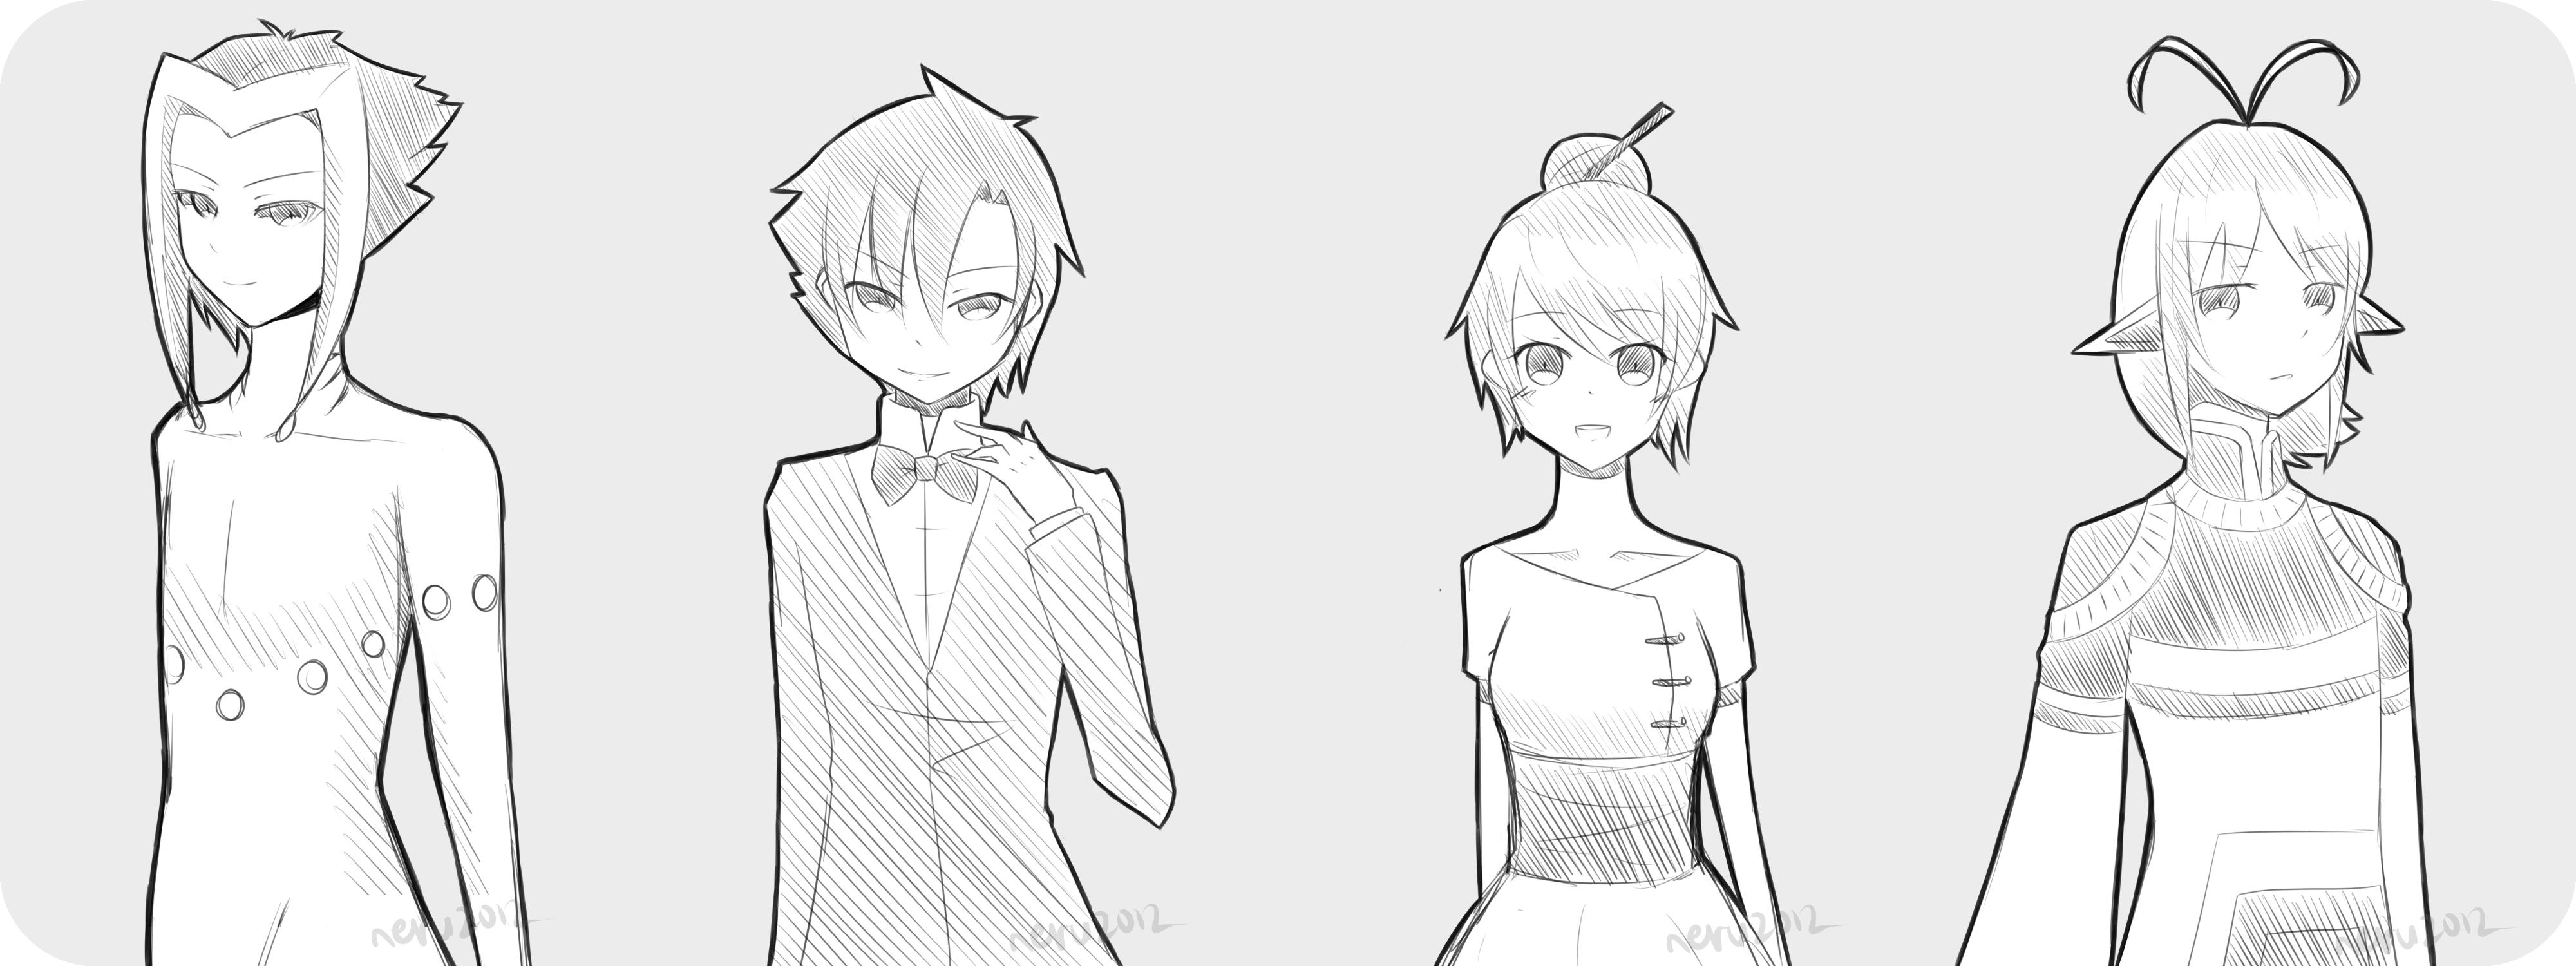 Sketch Requests 5 by neruteru